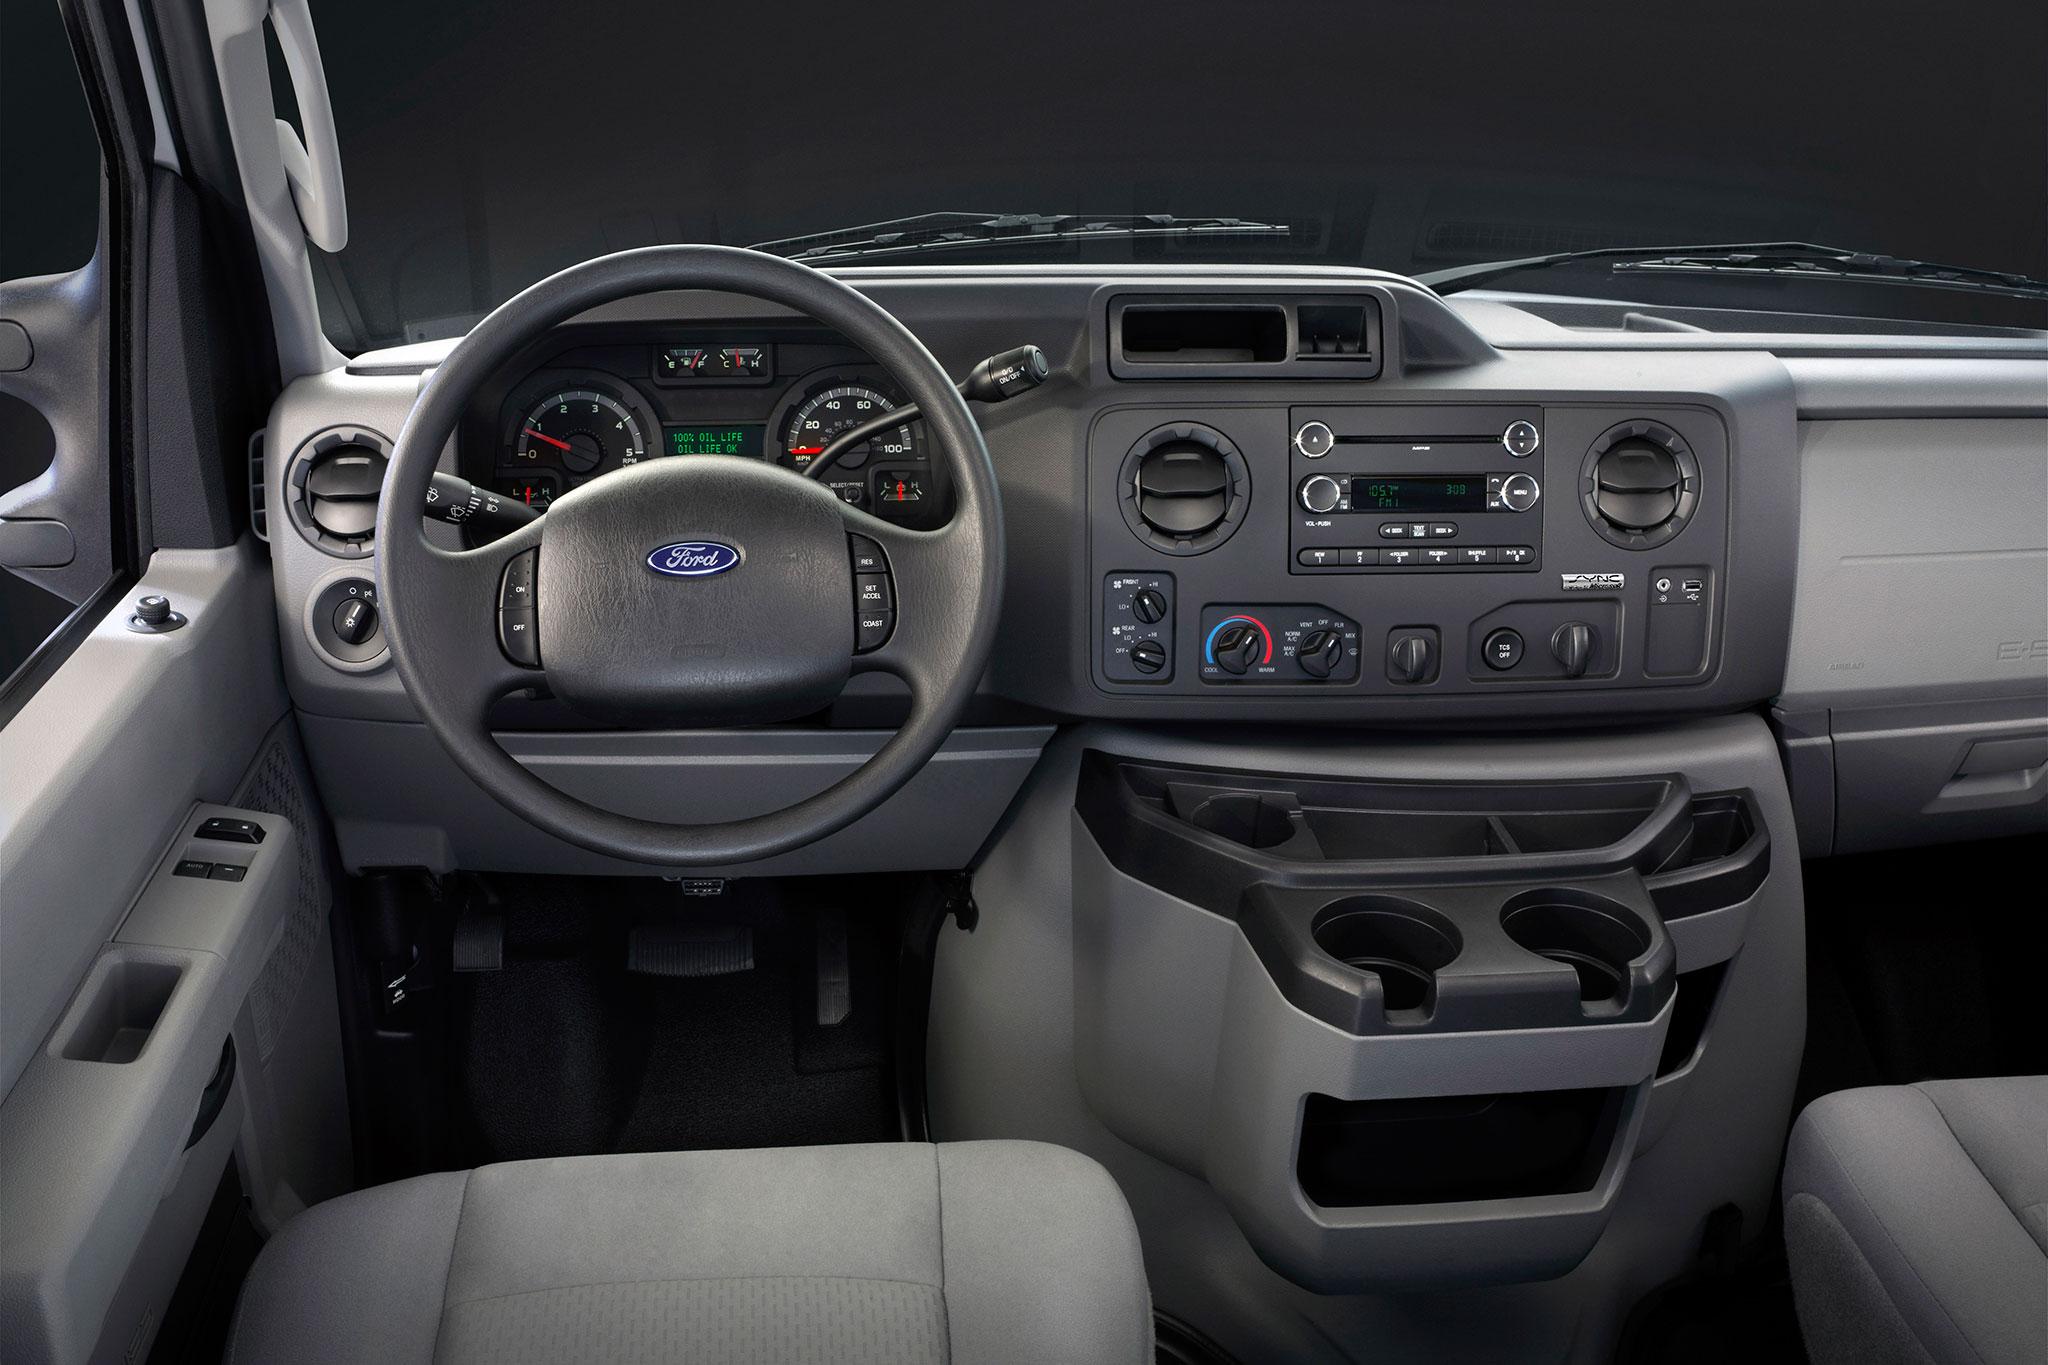 Roush Unveils Propane-powered Ford E-250 Vans